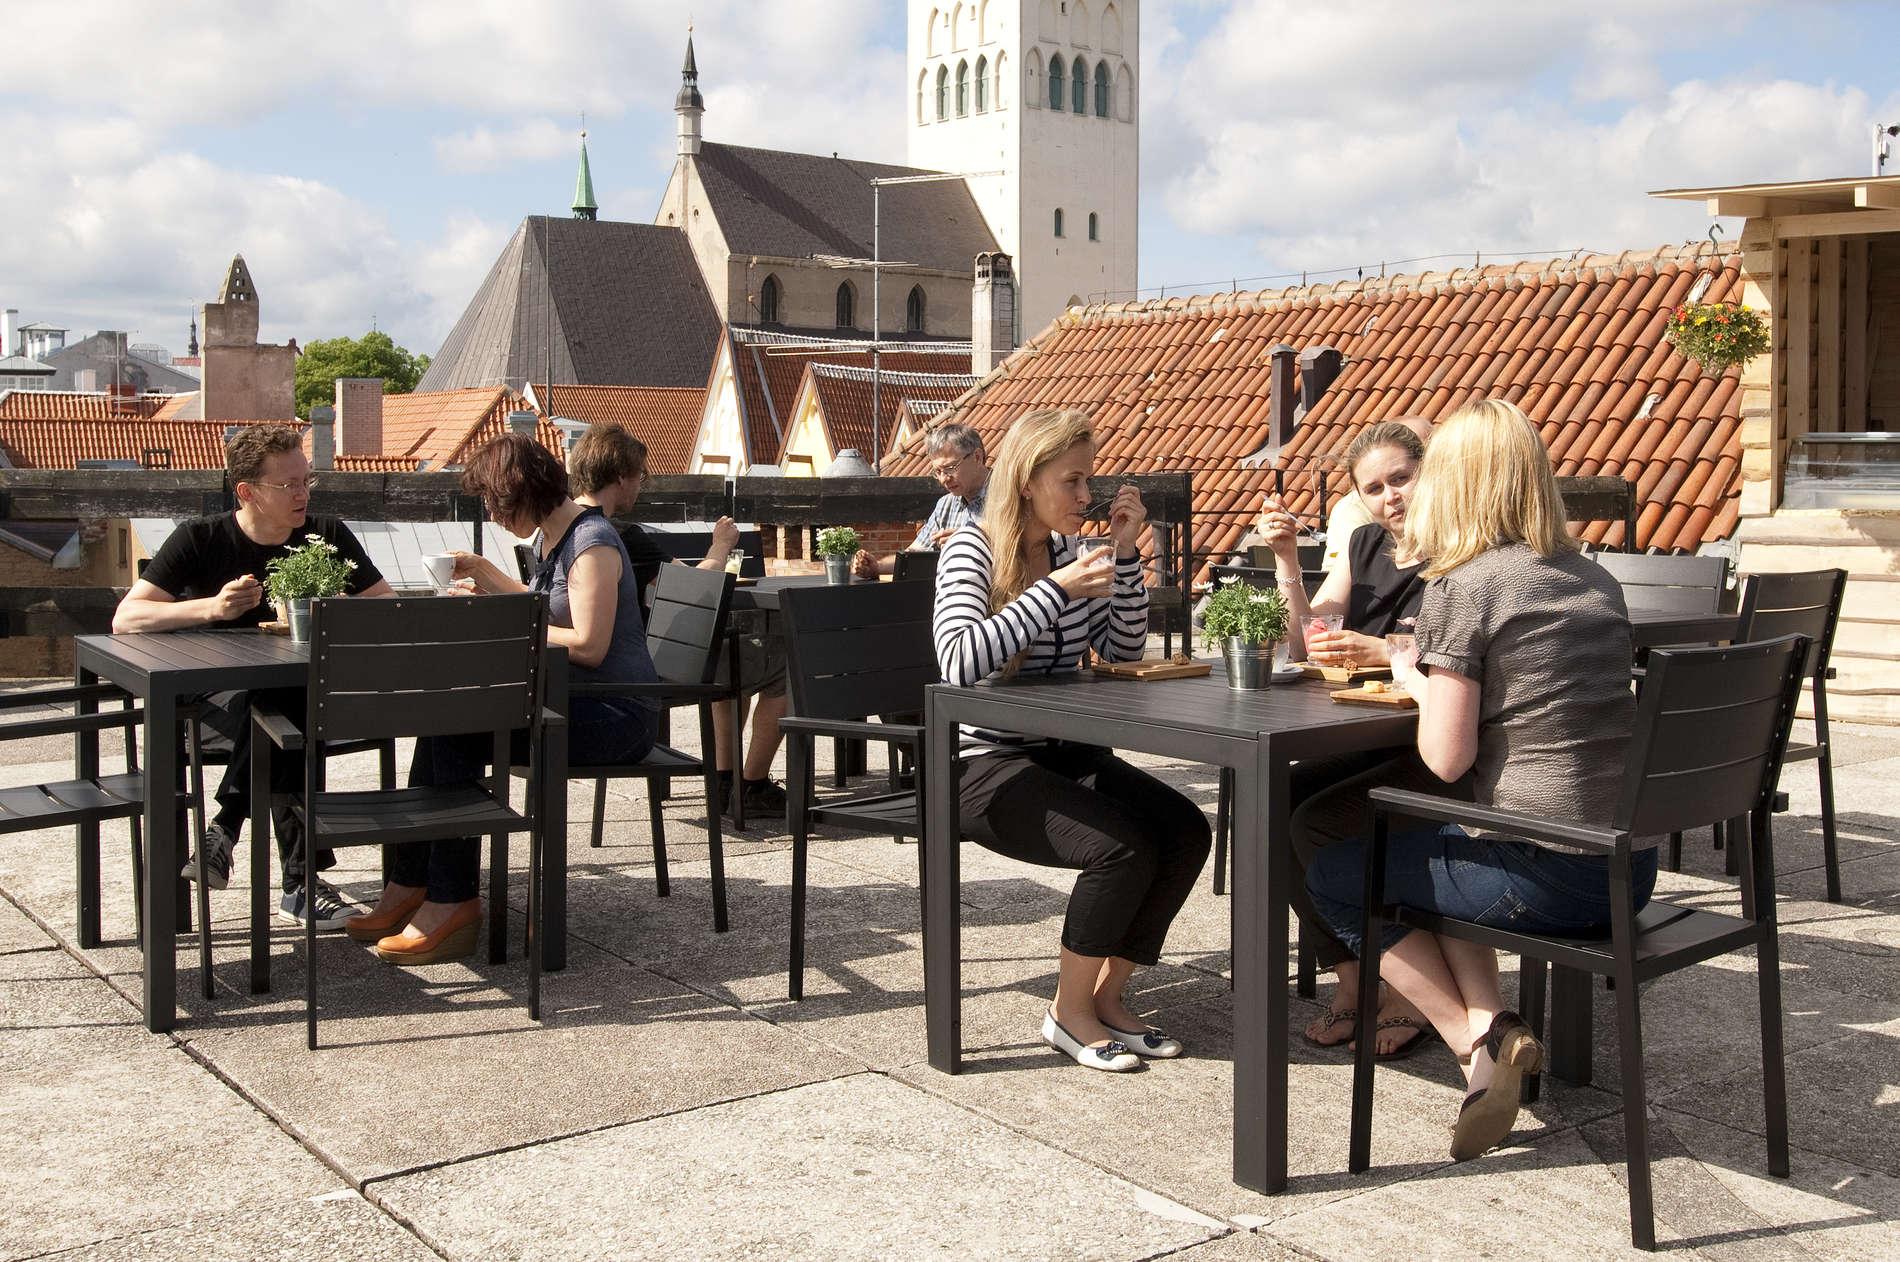 Estonian Maritime Museum – Fat Margaret's Tower - vabavalik